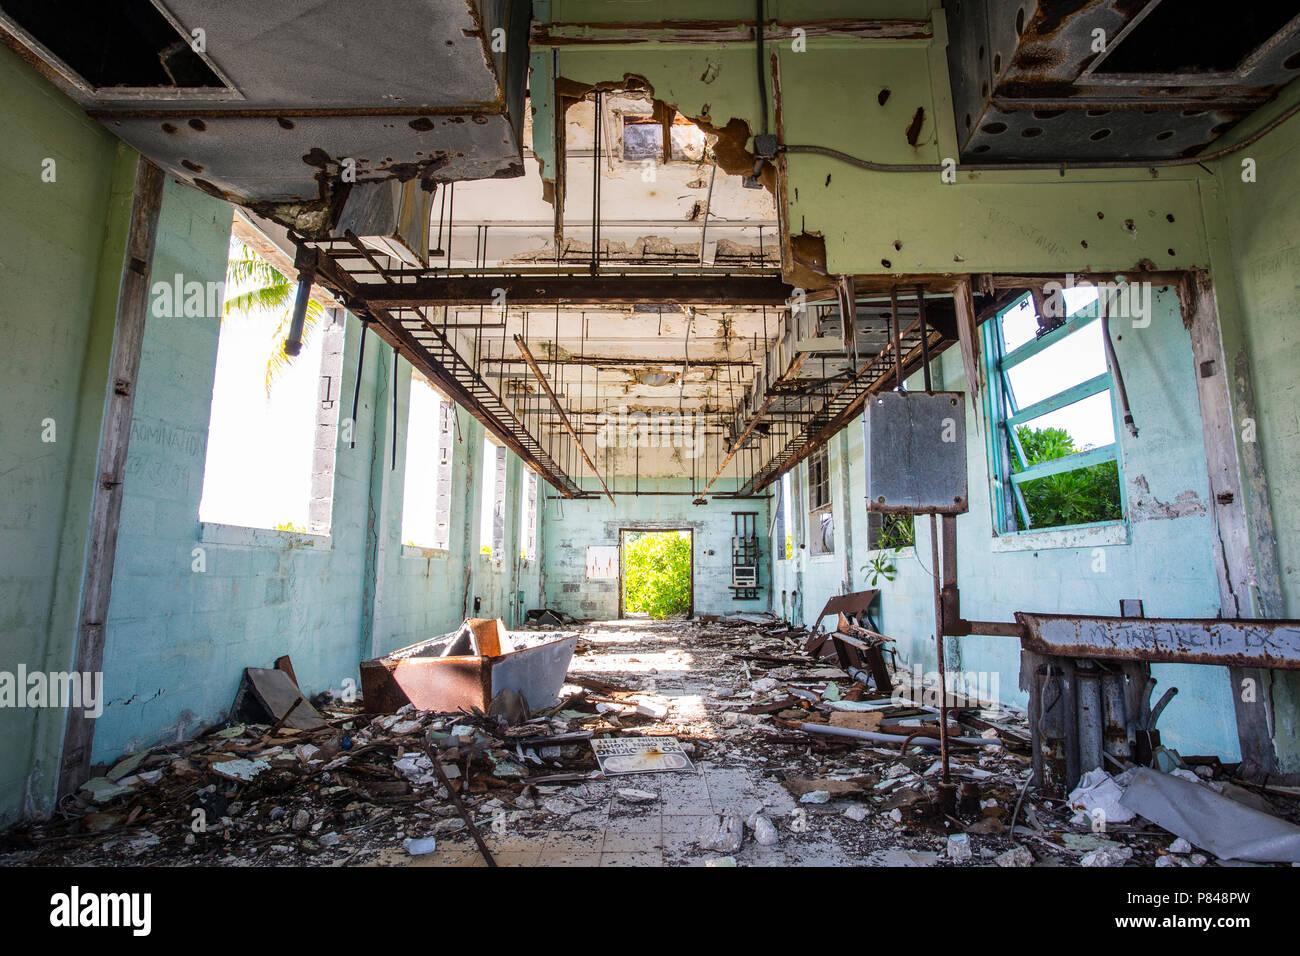 Abandoned building on Kanton Island, Kiribati from the United States in World War 2. - Stock Image